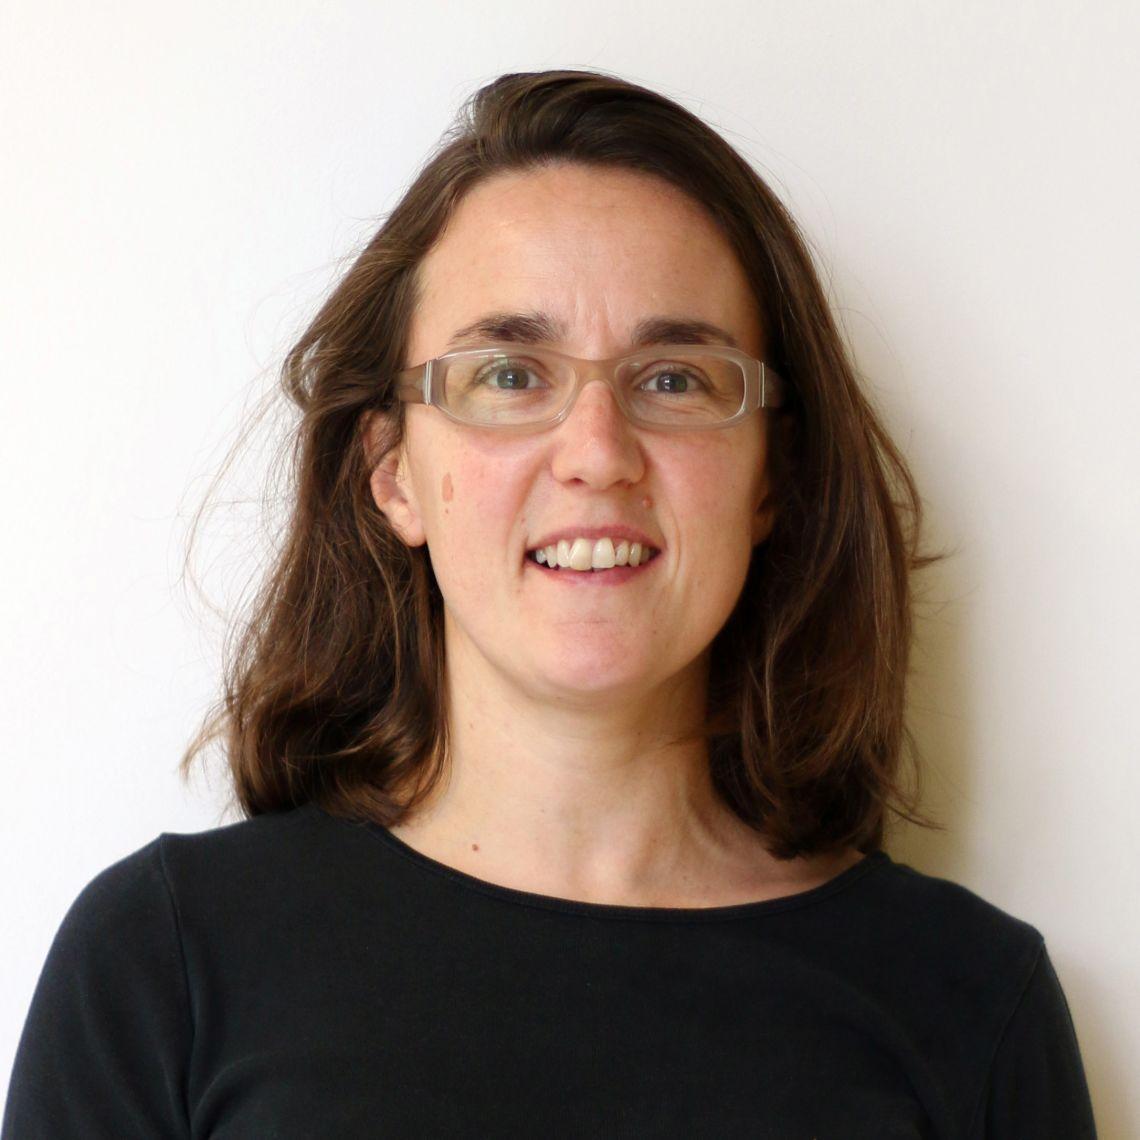 Associate Professor Marion Mafham